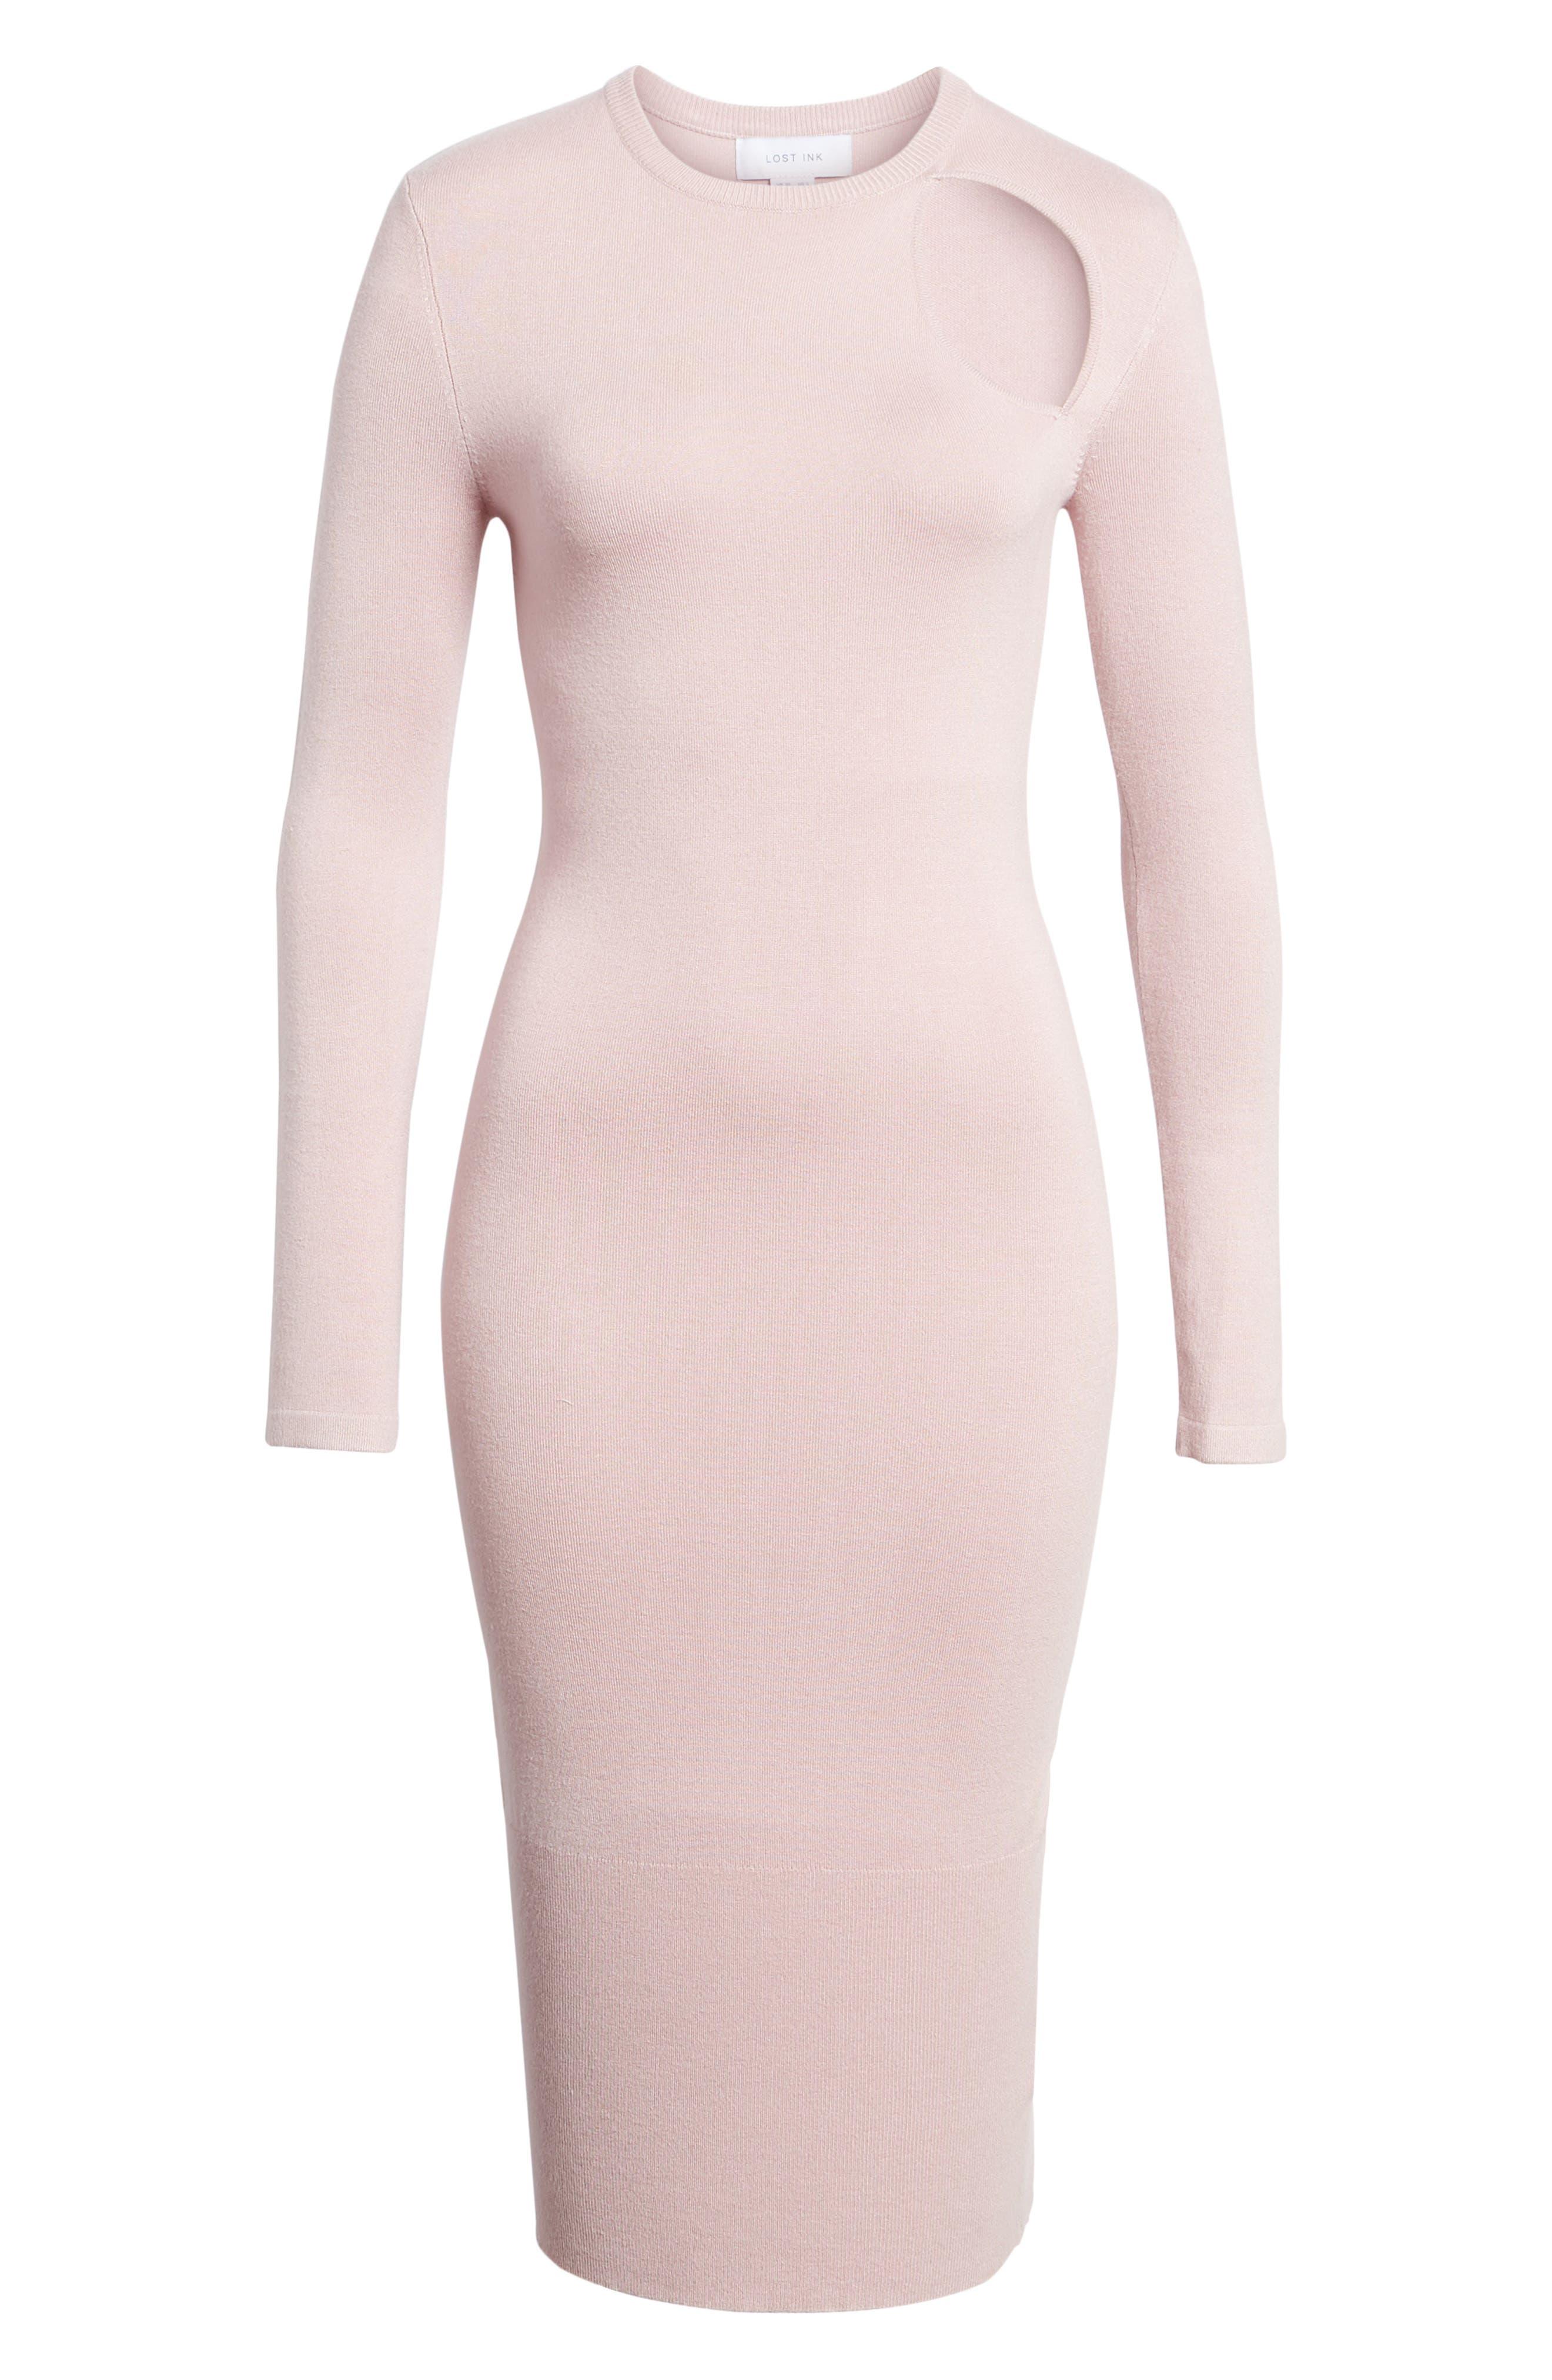 Body-Con Midi Dress,                             Alternate thumbnail 6, color,                             Light Pink